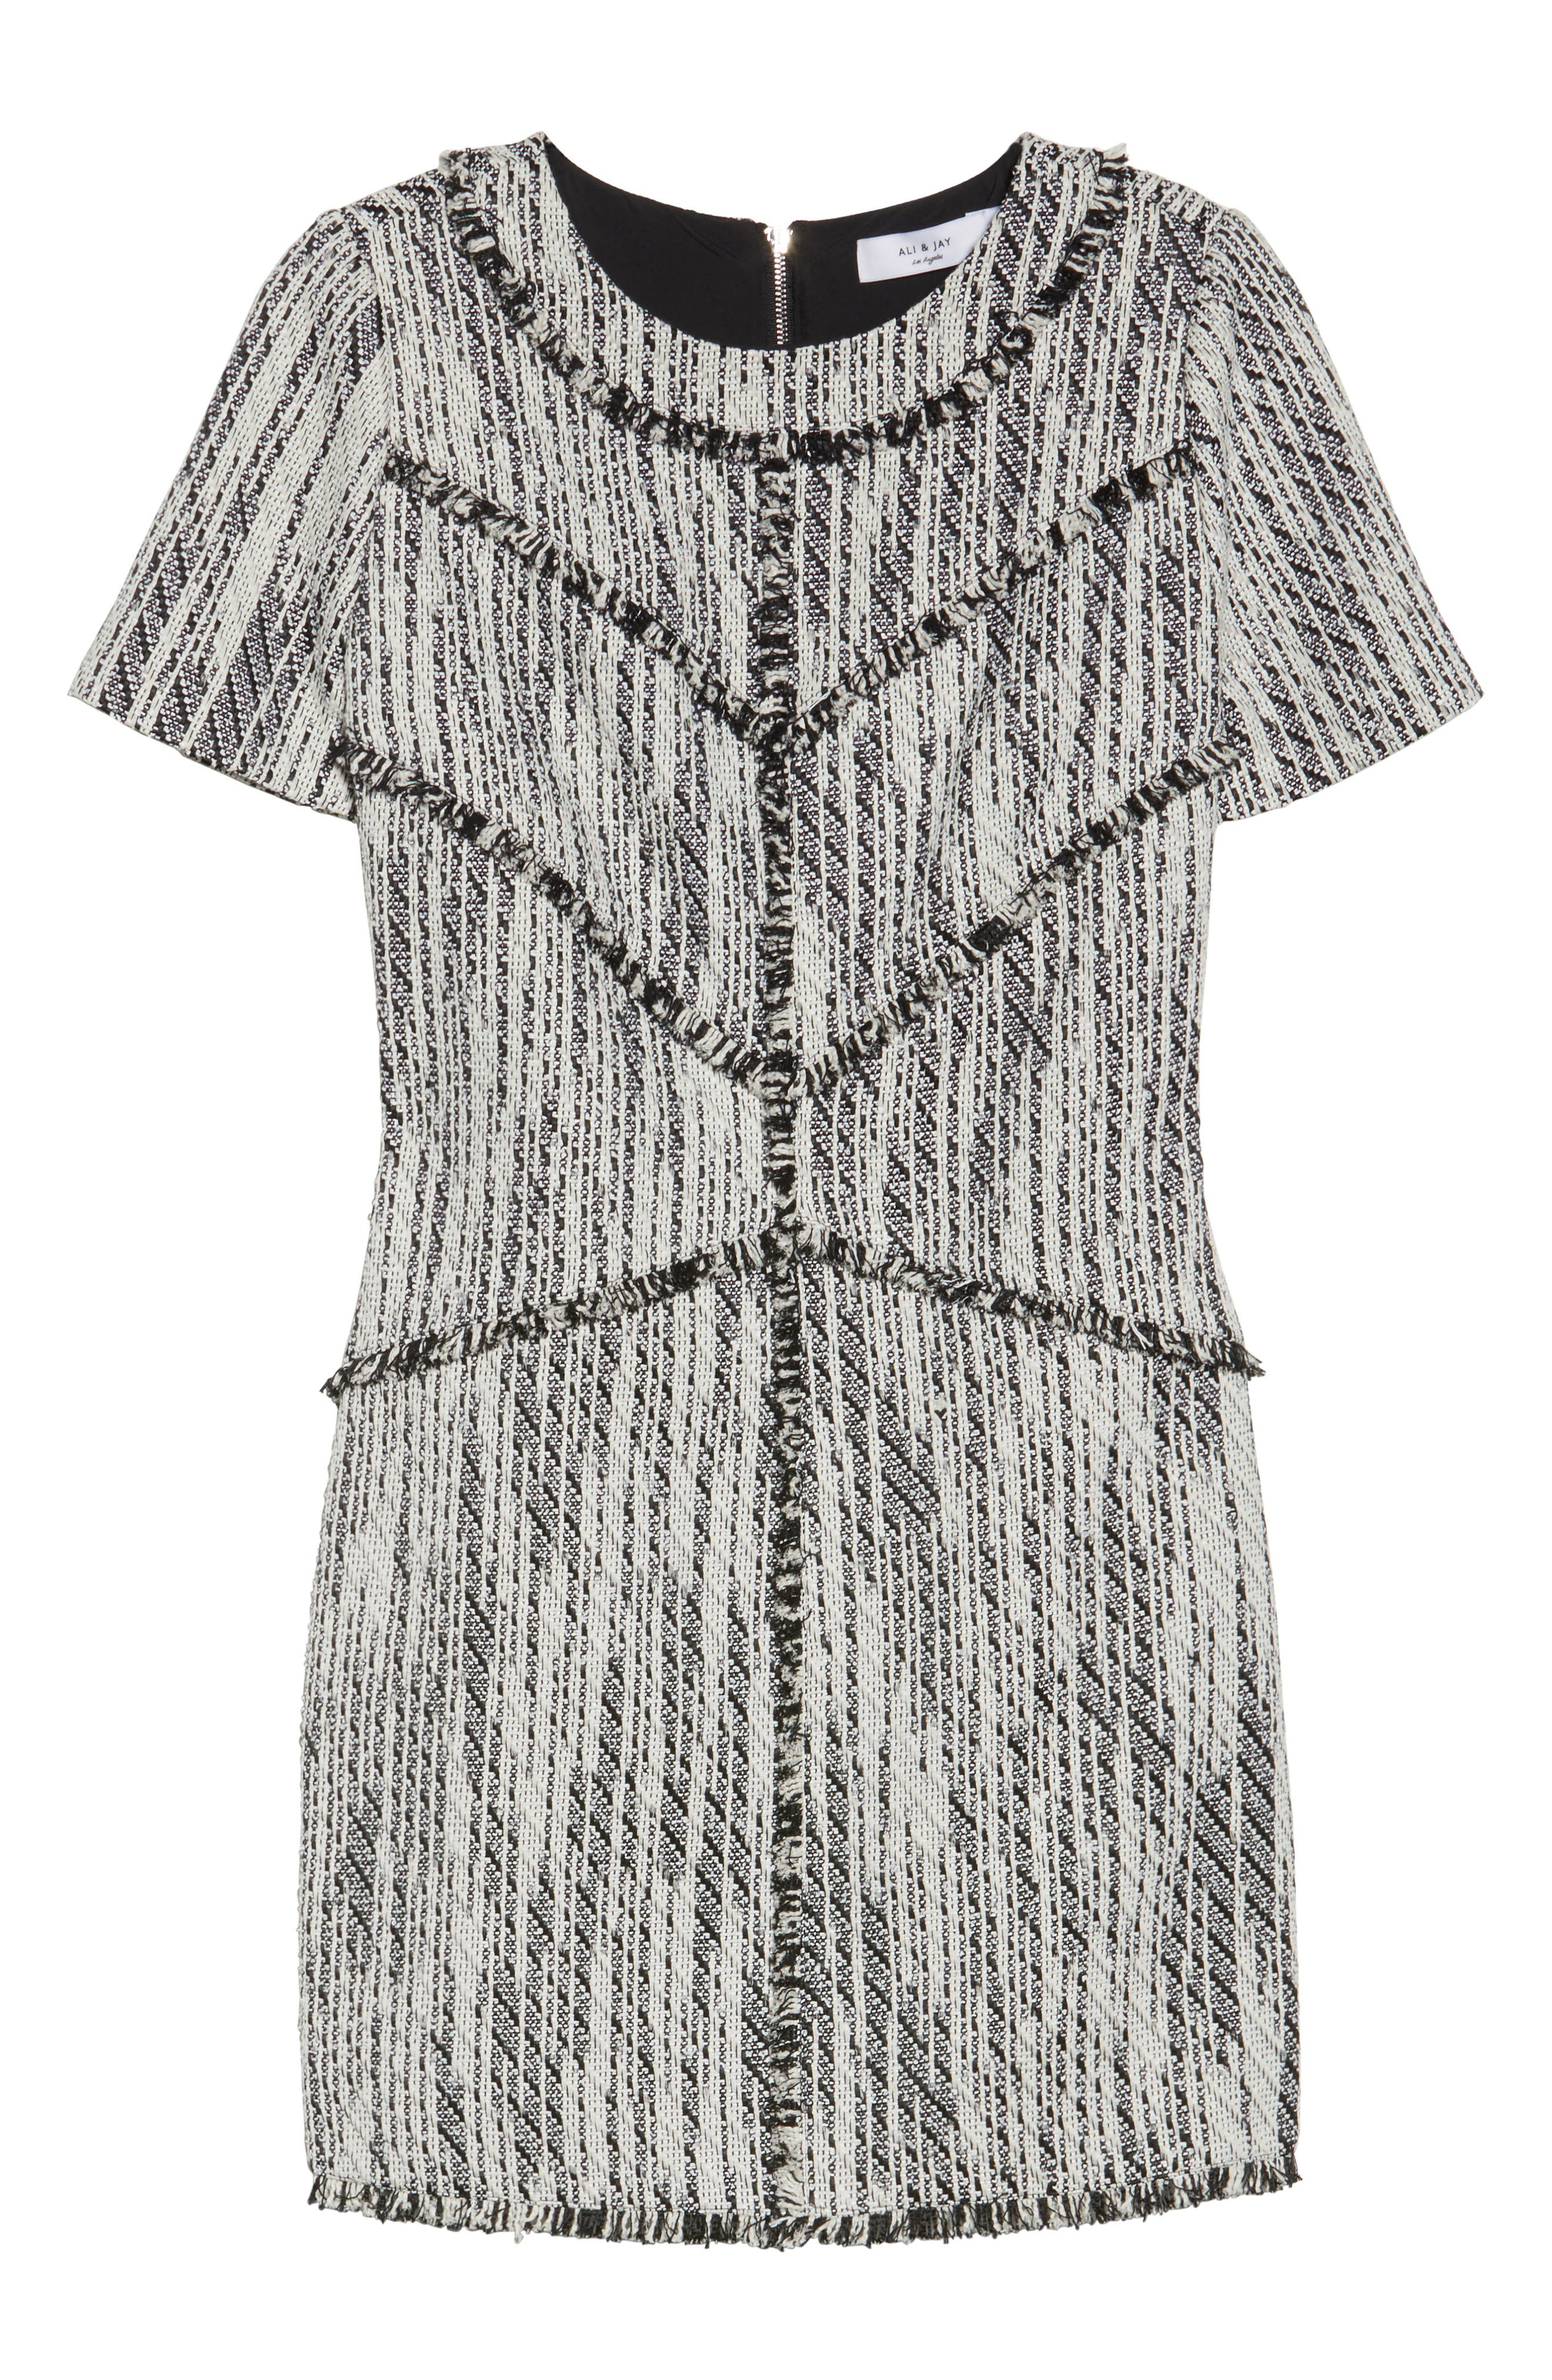 Dolce Vita Tweed Shift Dress,                             Alternate thumbnail 6, color,                             100